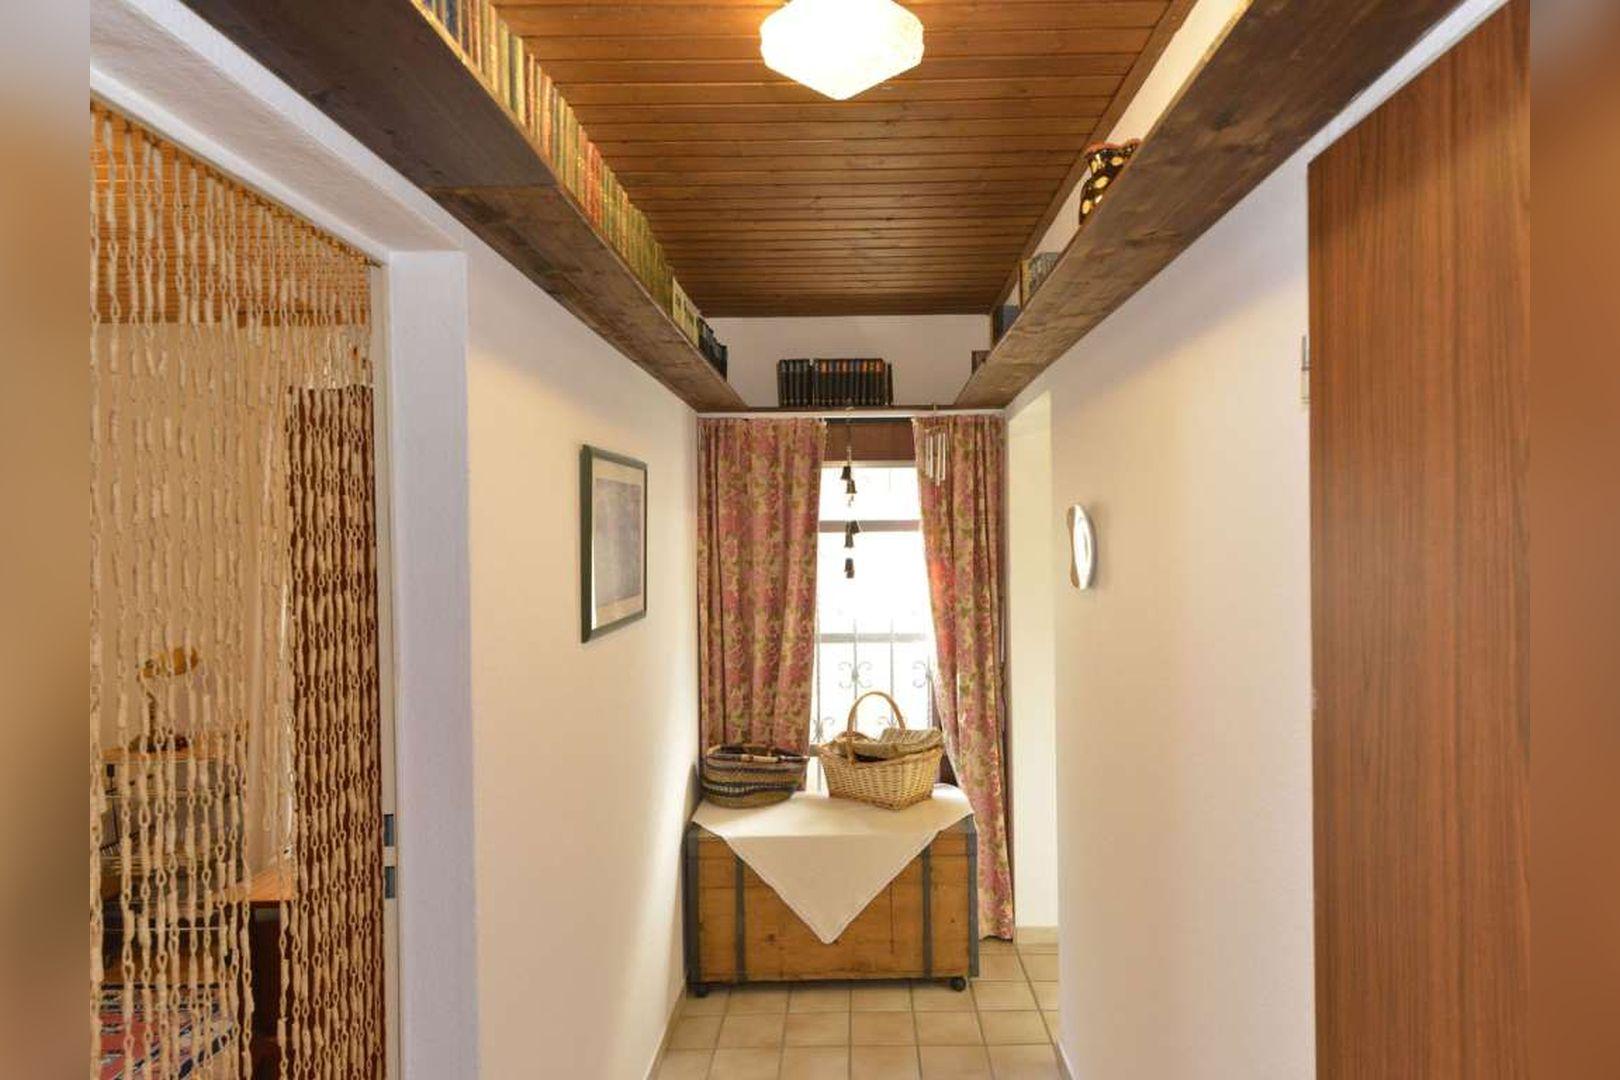 Immobilie Nr.0254 - Doppelhaushälfte rechtsbündig mit Garage & Carport  - Bild 16.jpg